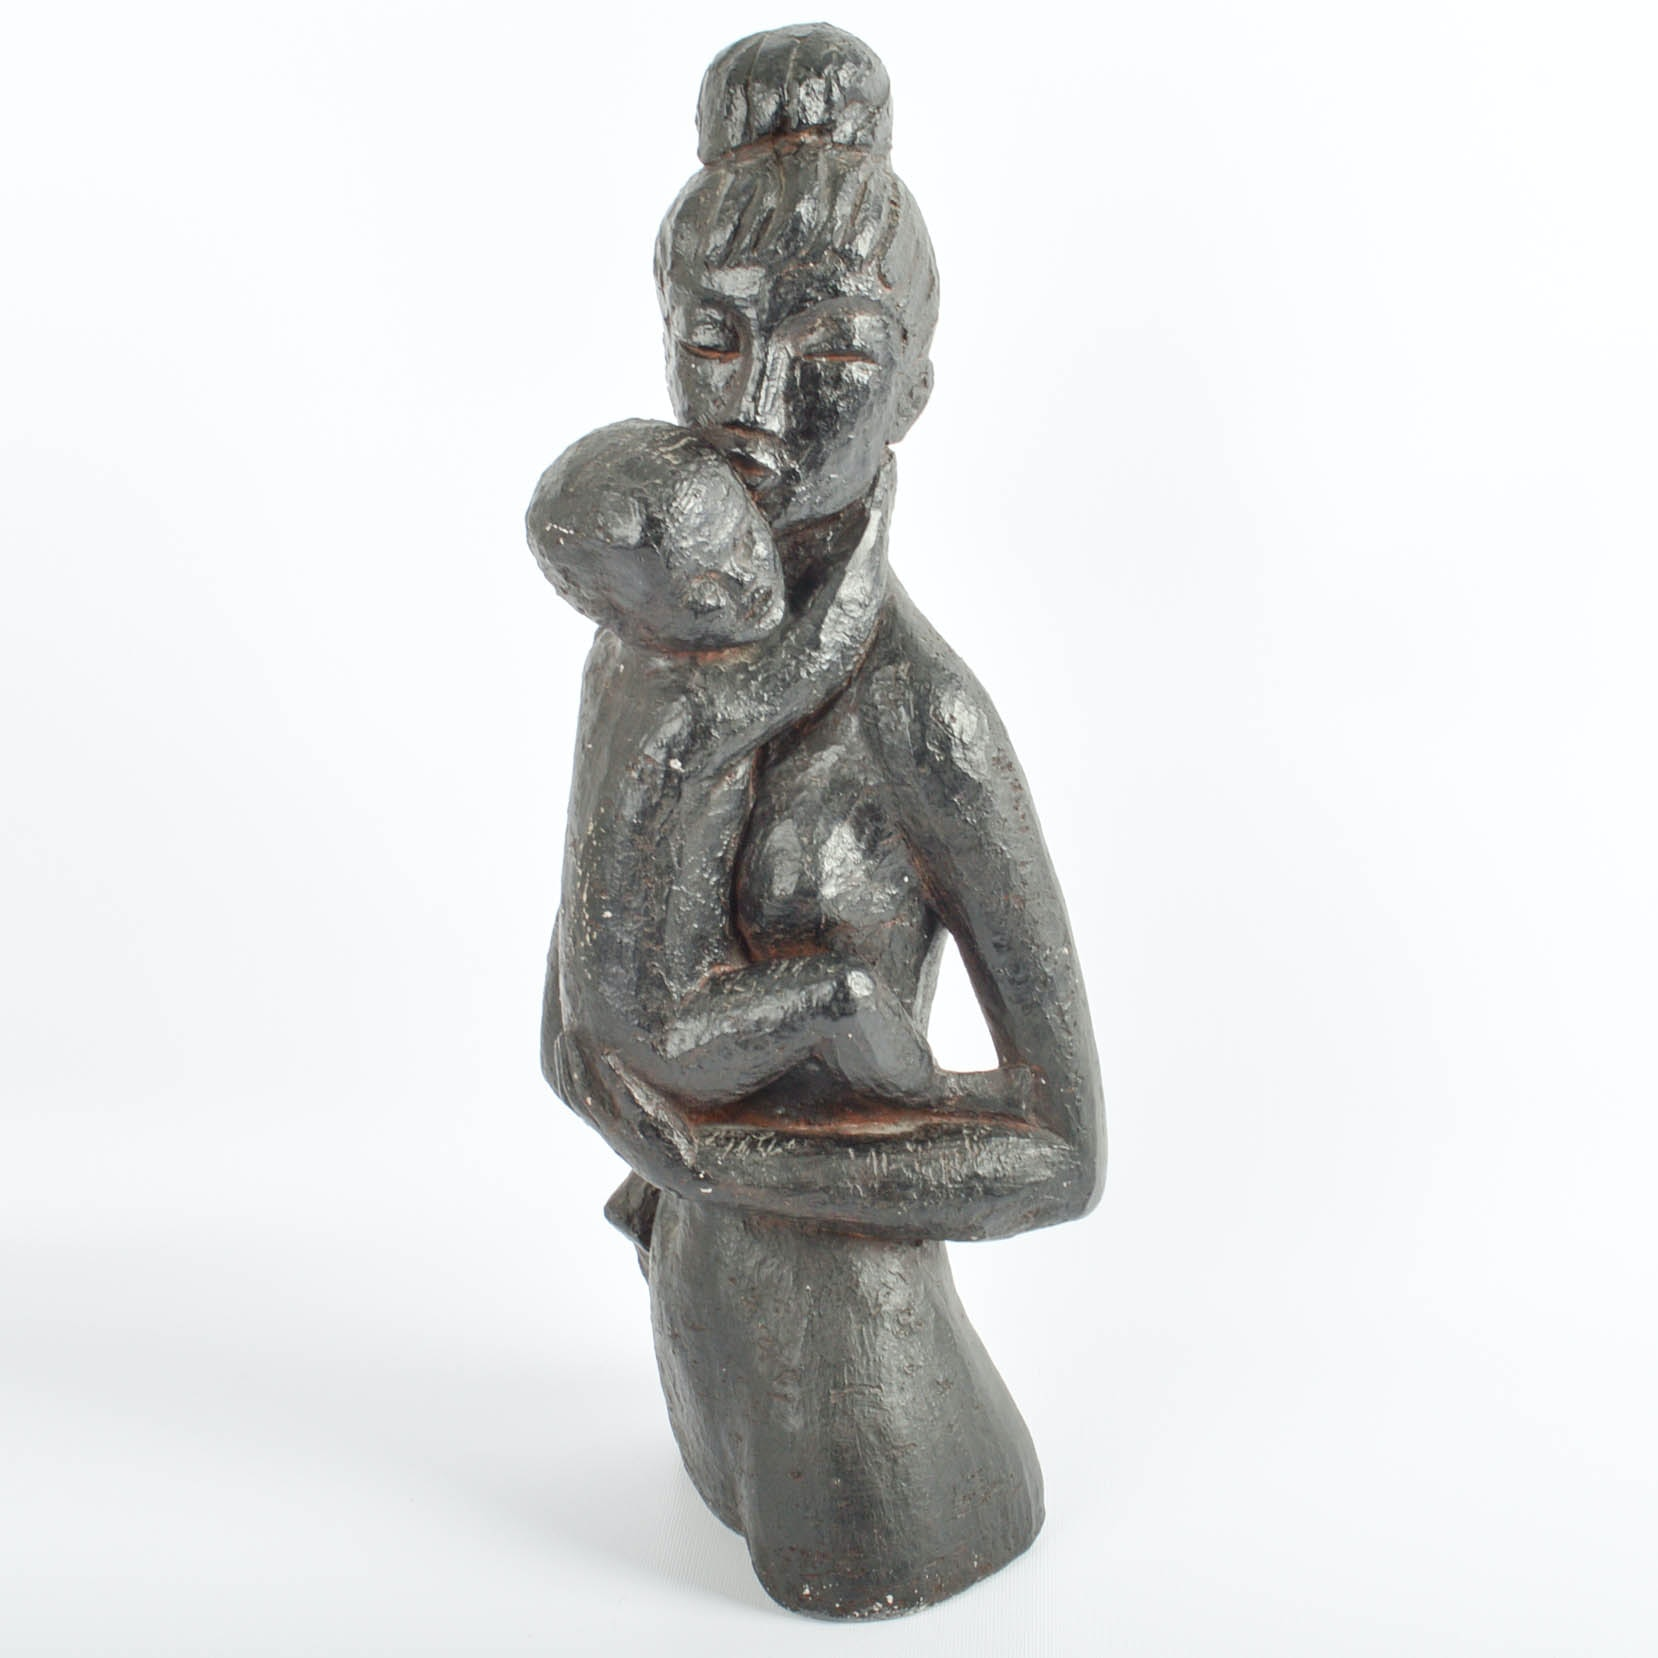 Vintage Mother and Child Sculpture